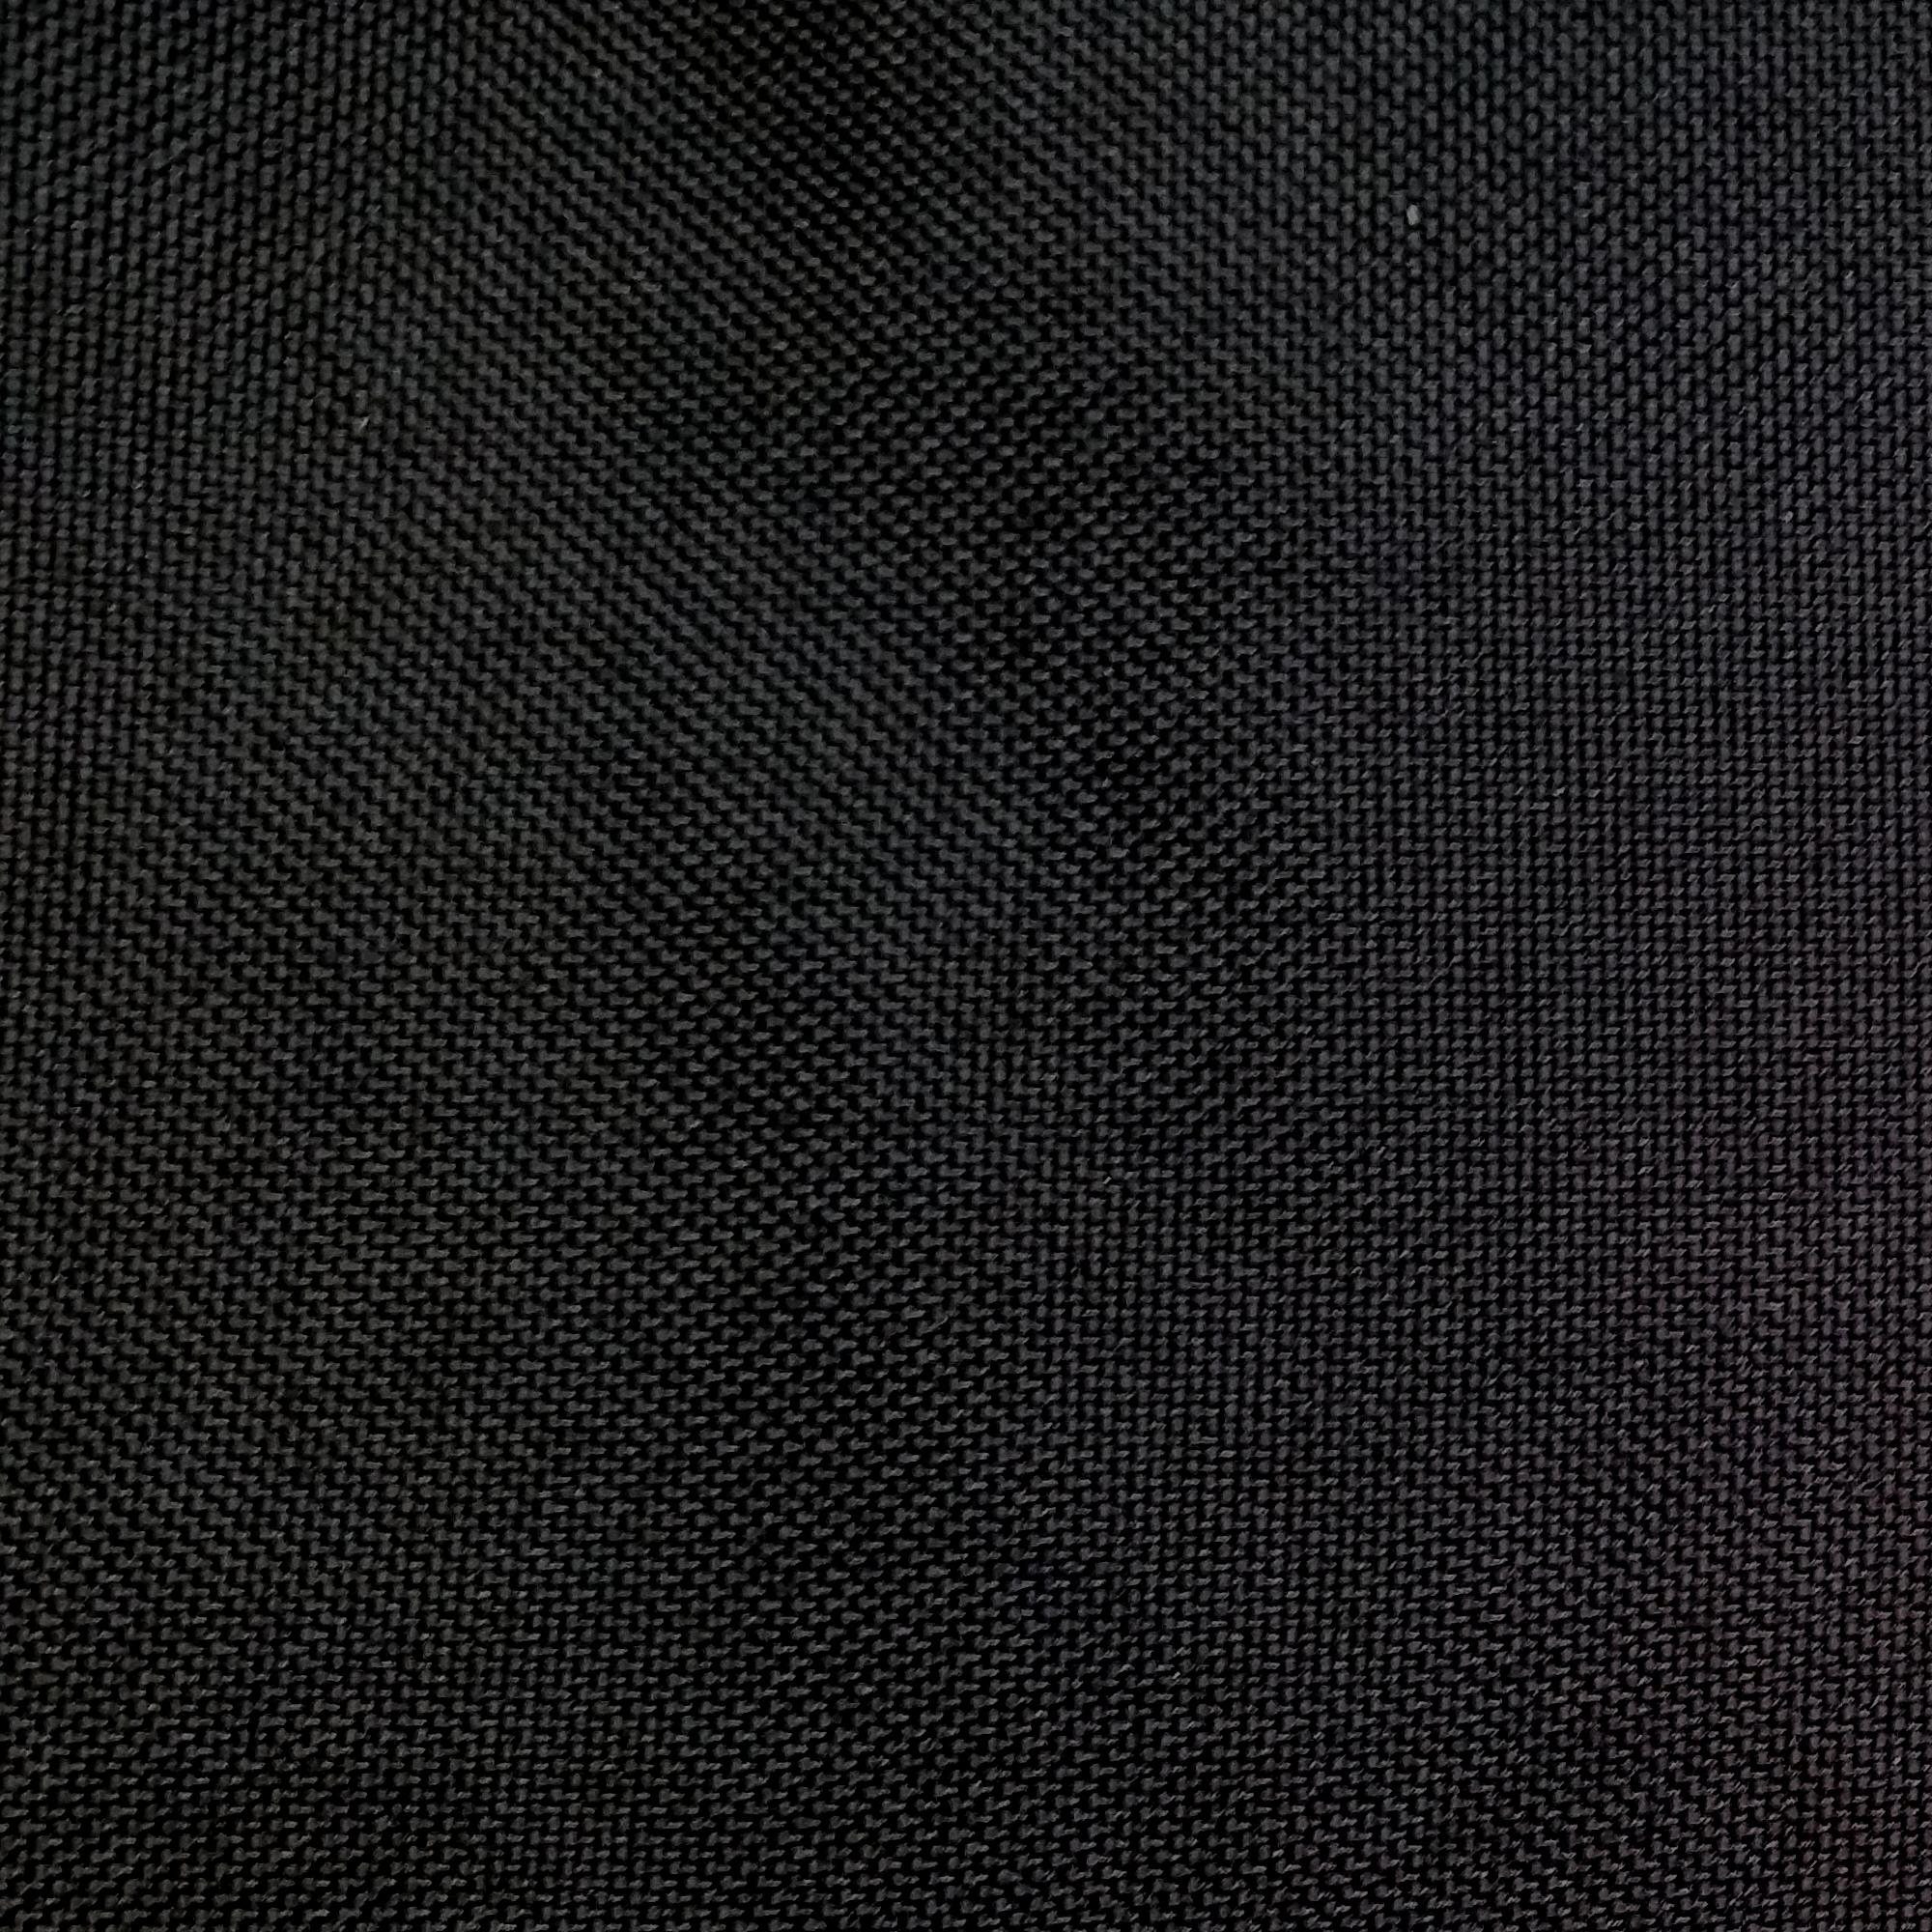 1000 Denier Coated CORDURA® Nylon, 60 Inches Wide, Fabric By the Yard, Black